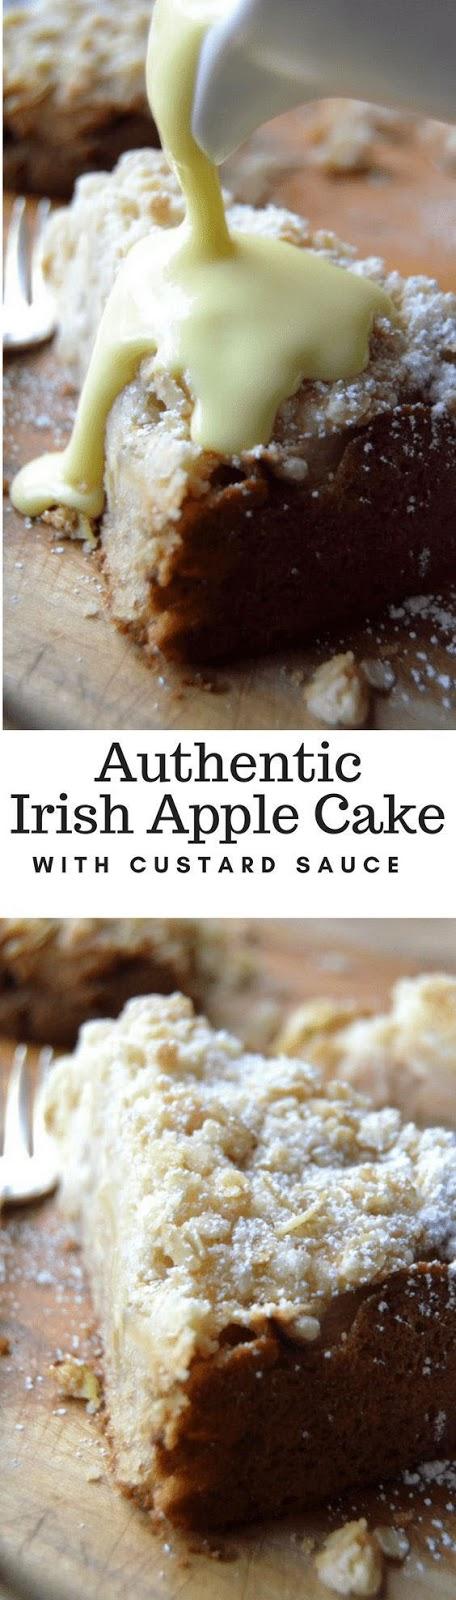 Authentic Irish Apple Cake With Custard Sauce